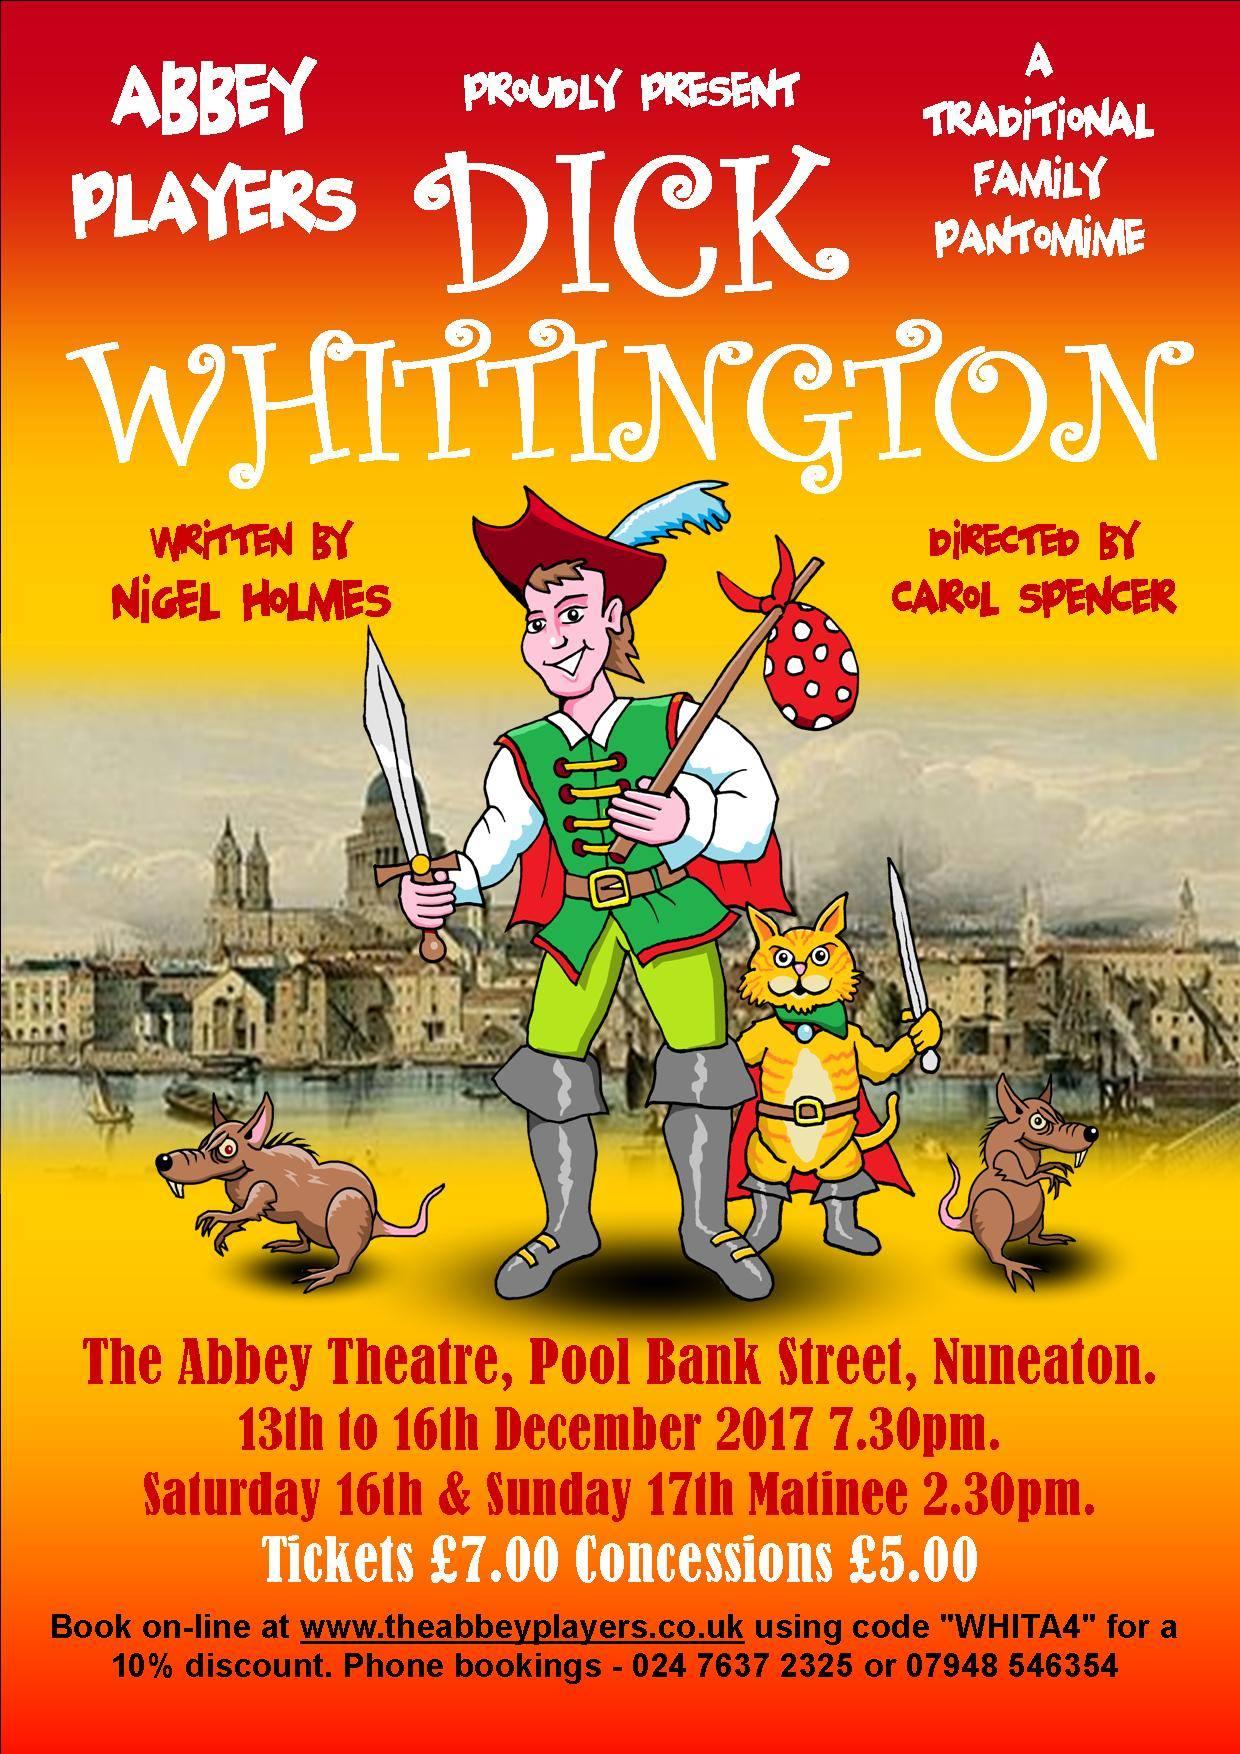 Abbey Players Present Dick Whittington By Nigel Holmes